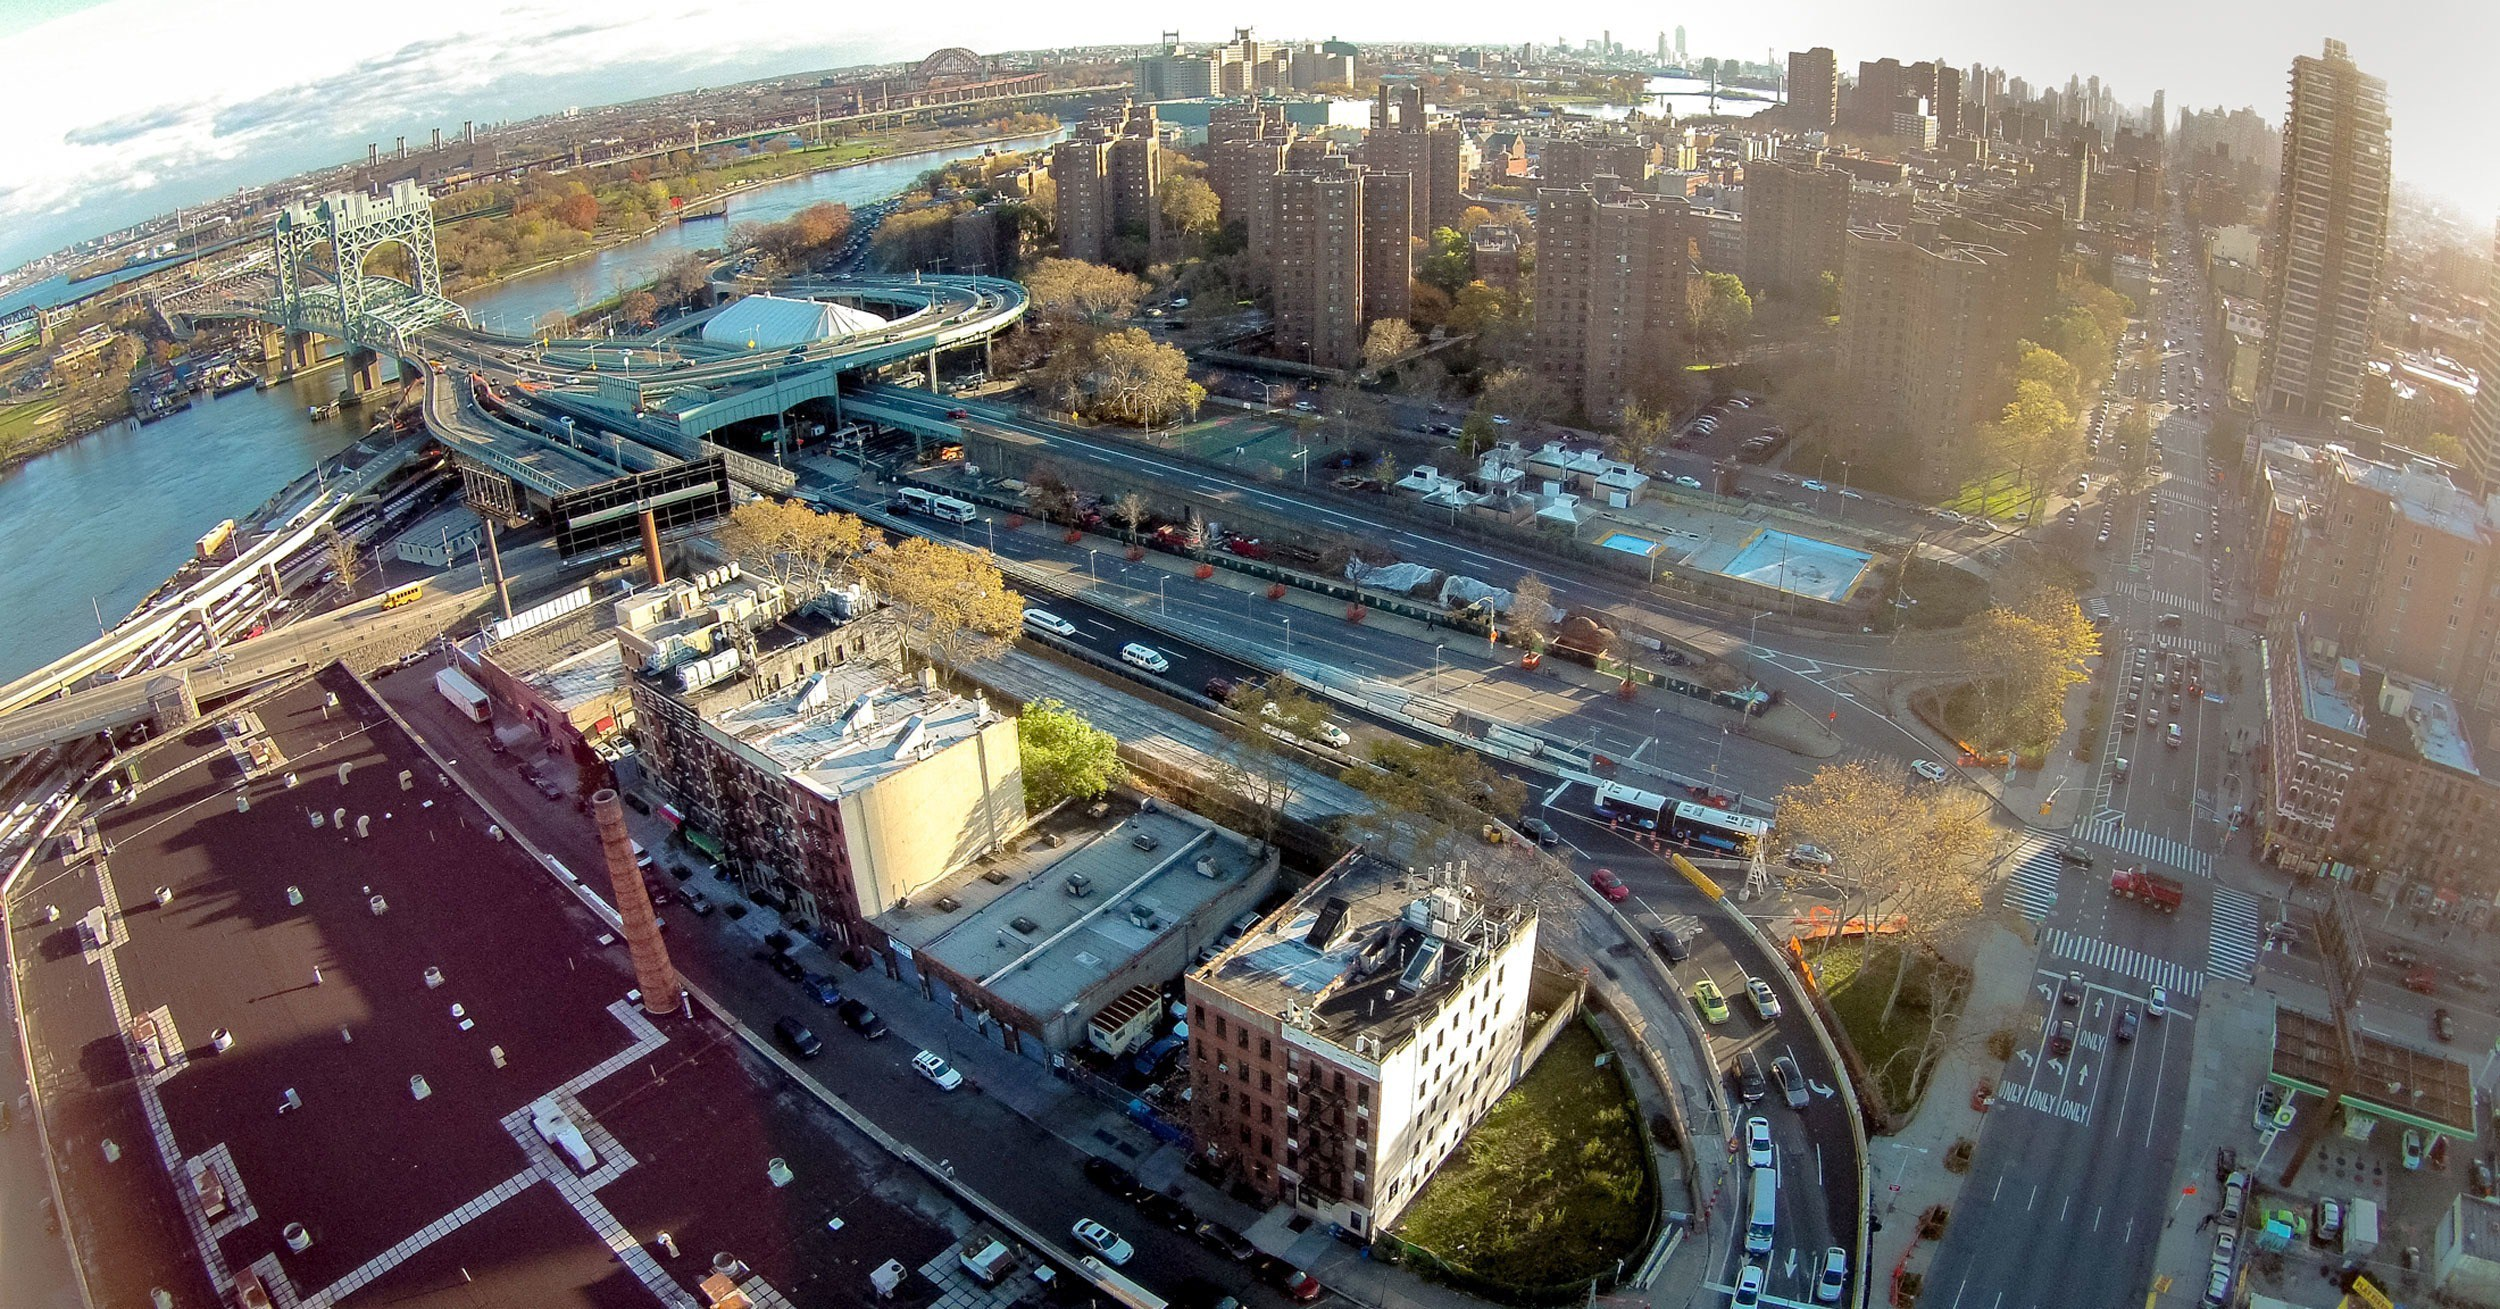 Robert F. Kennedy Bridge off ramp on the East side of Harlem.